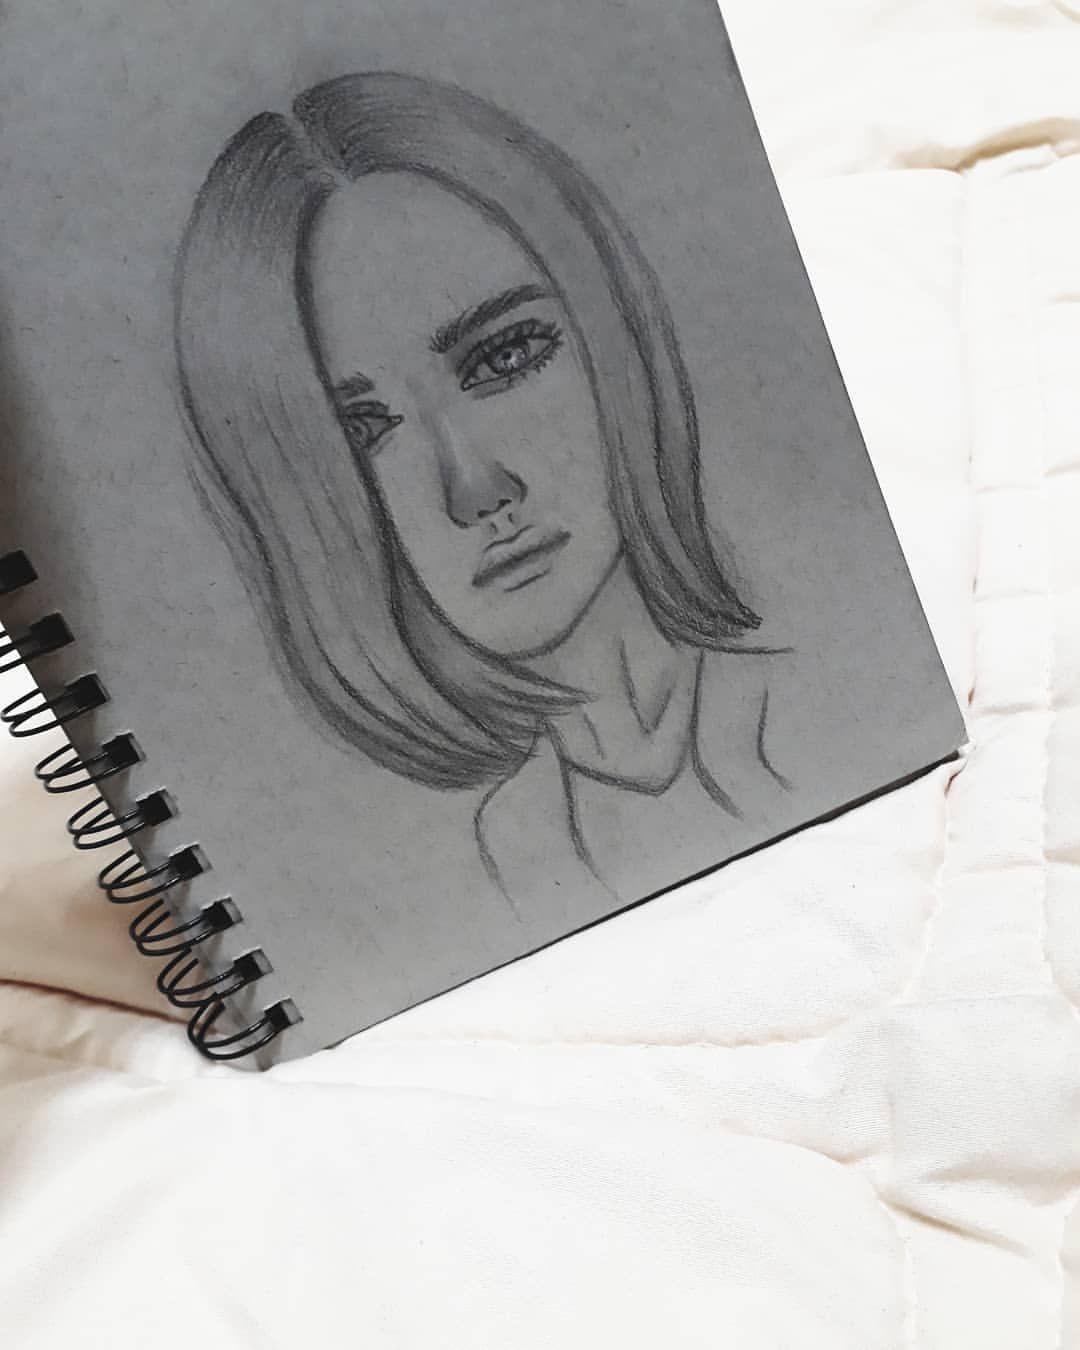 سلاما على لون الحزن في عيناك صارت حزينه Draw Drawings Drawing Art Artist Artists Face Sketchbooksketch رسمتي Female Sketch Art Female